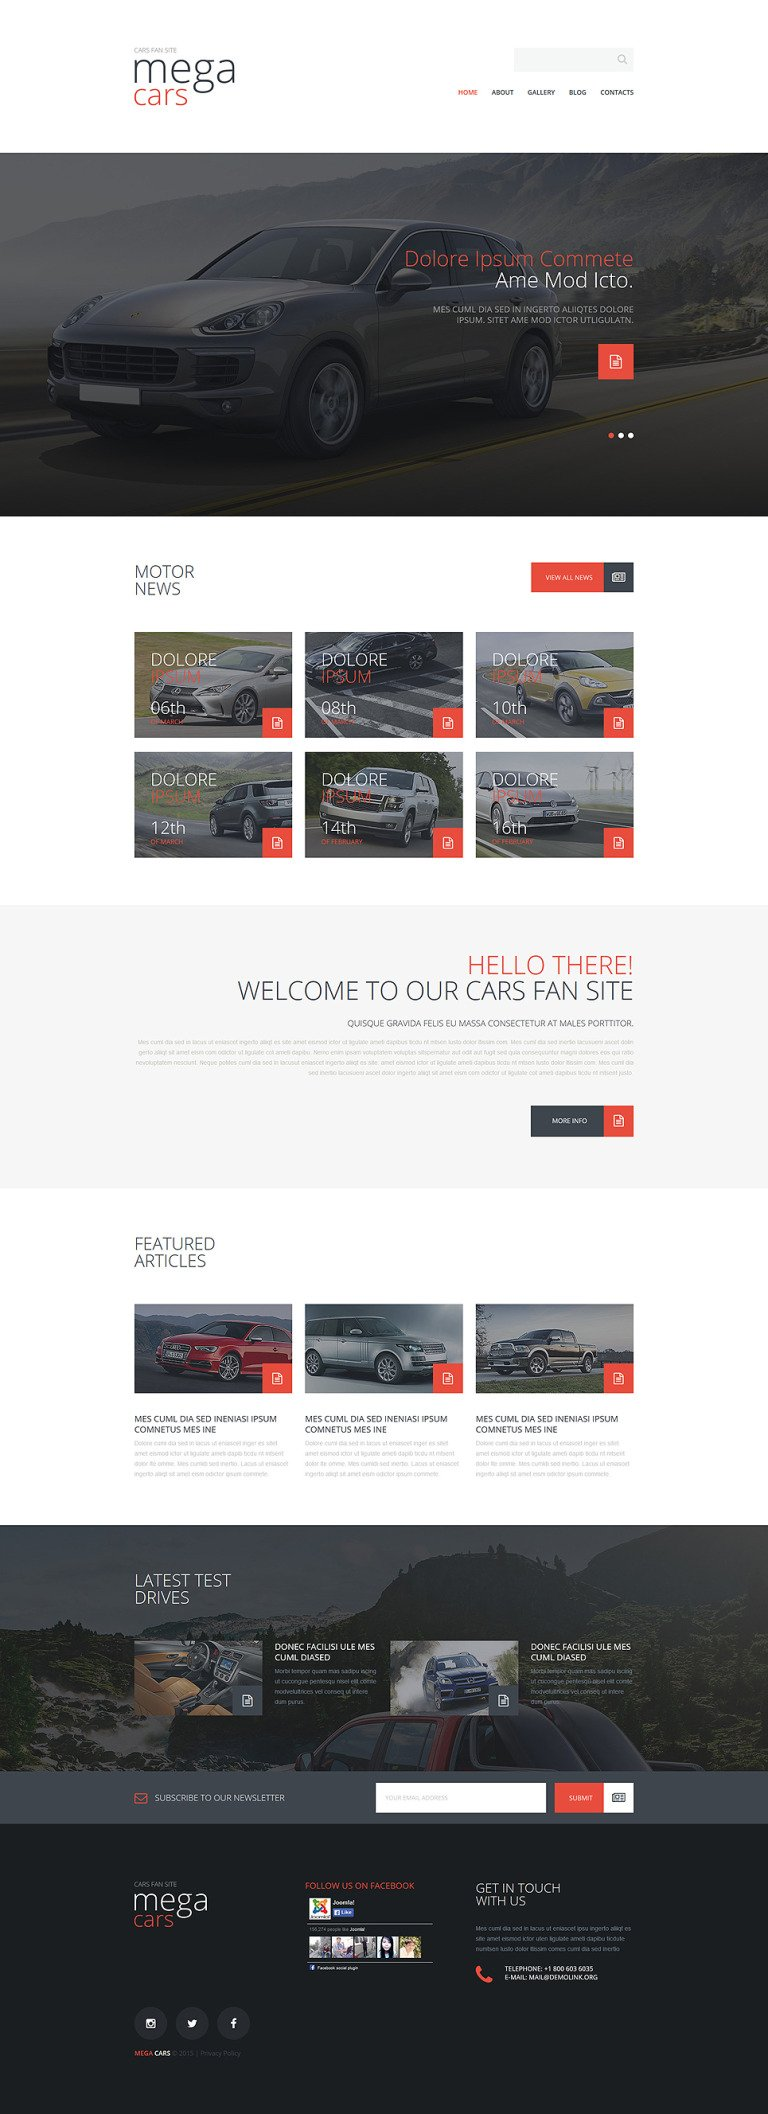 Cars Fan Site Joomla Template New Screenshots BIG